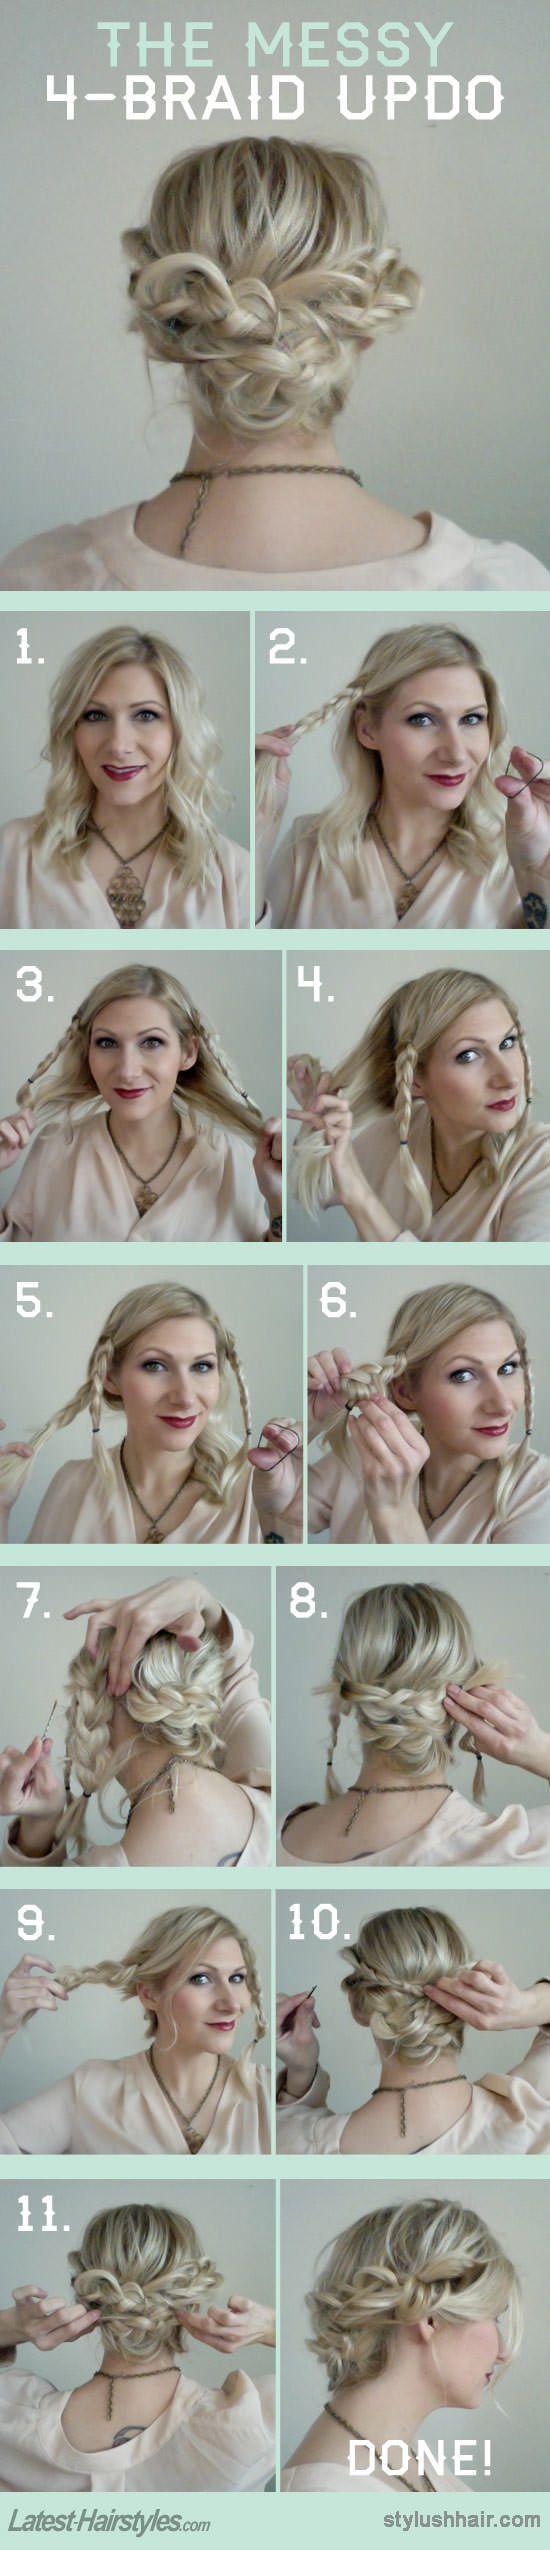 4 braid updo tutorial.